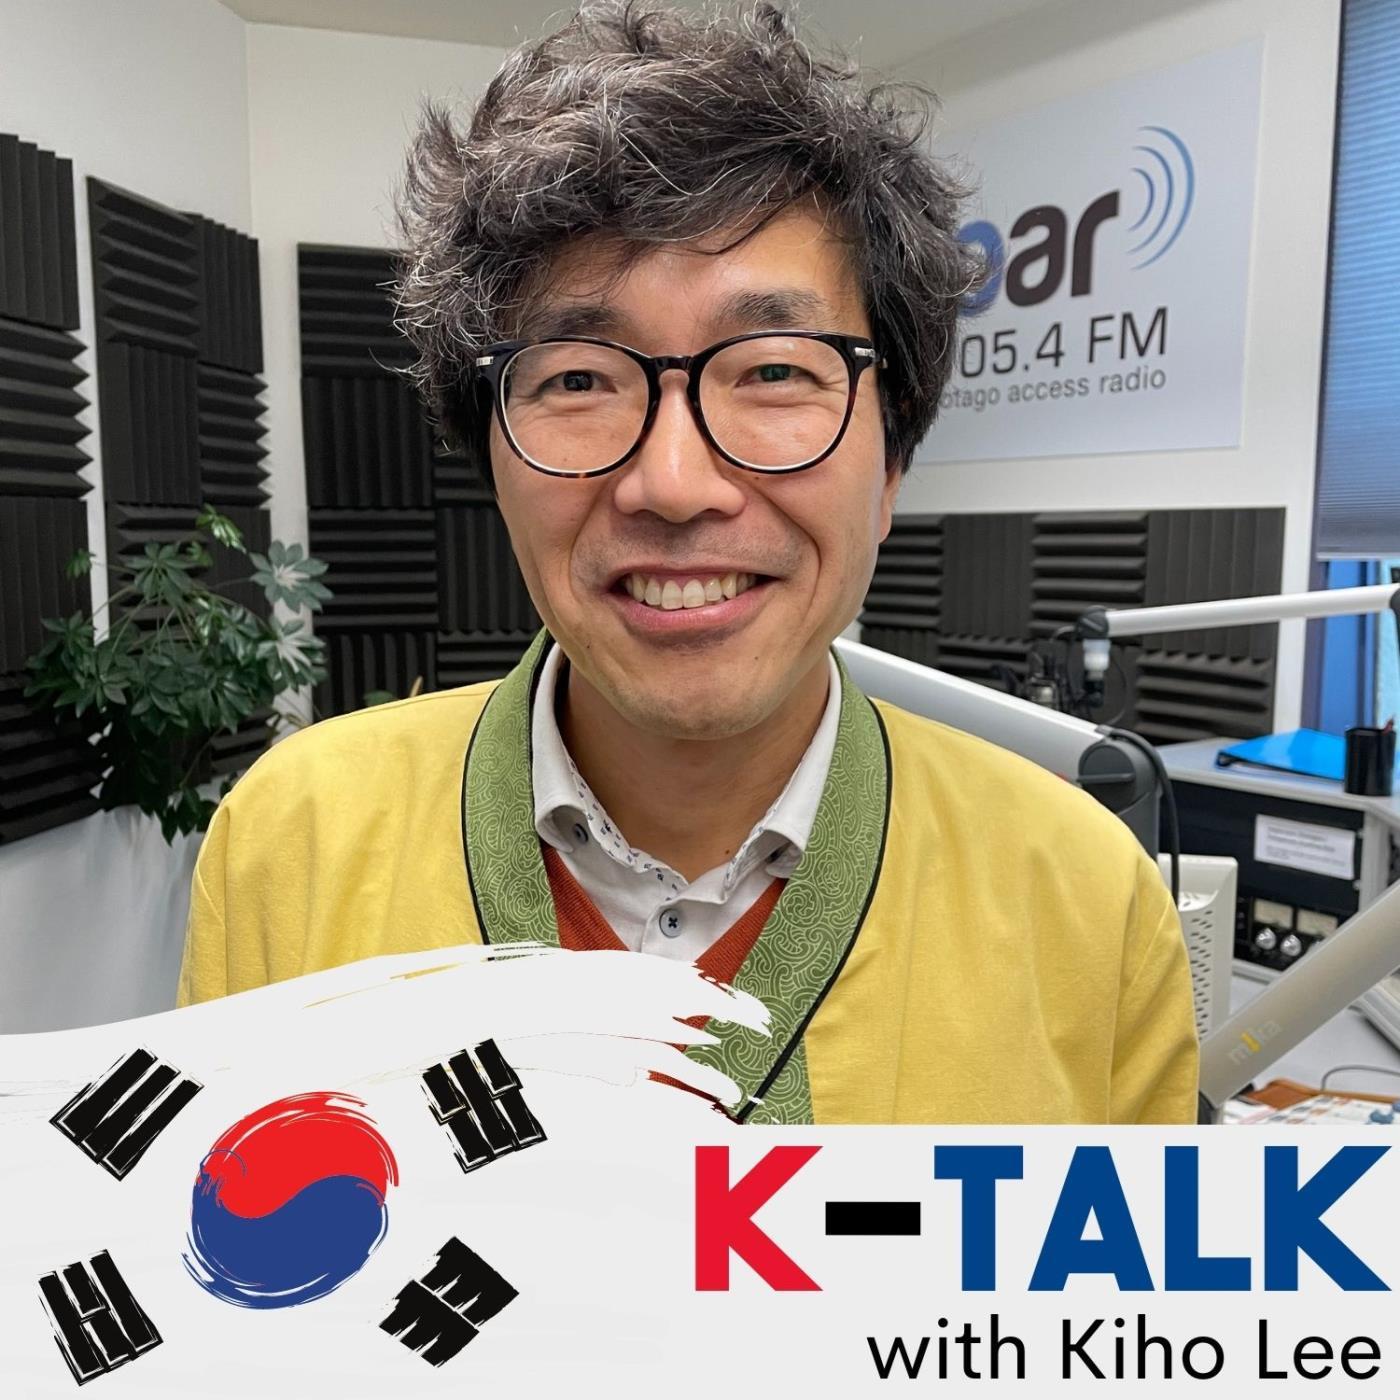 K-Talk with Kiho Lee